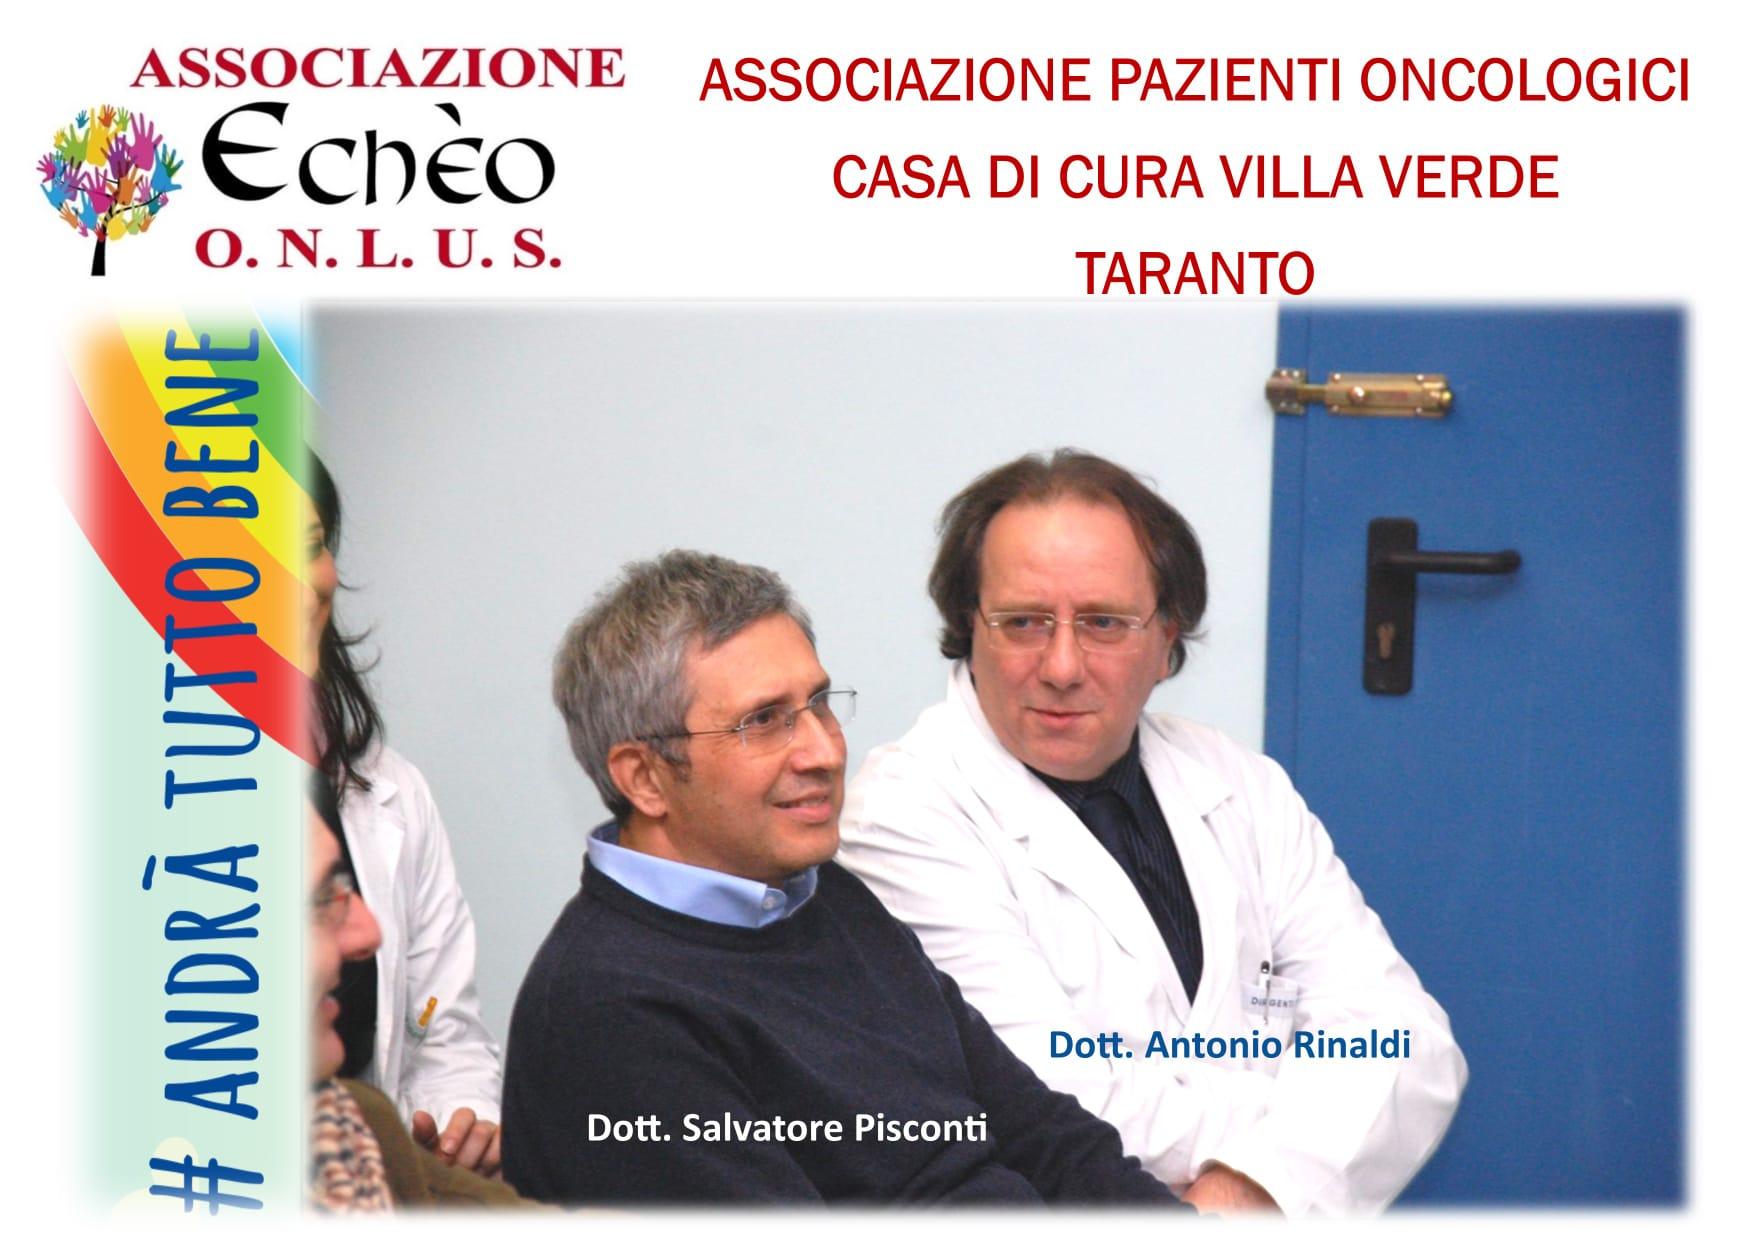 ASSOCIAZIONE PAZIENTI ONCOLOGICI CASA DI CURA VILLA VERDE, TARANTO